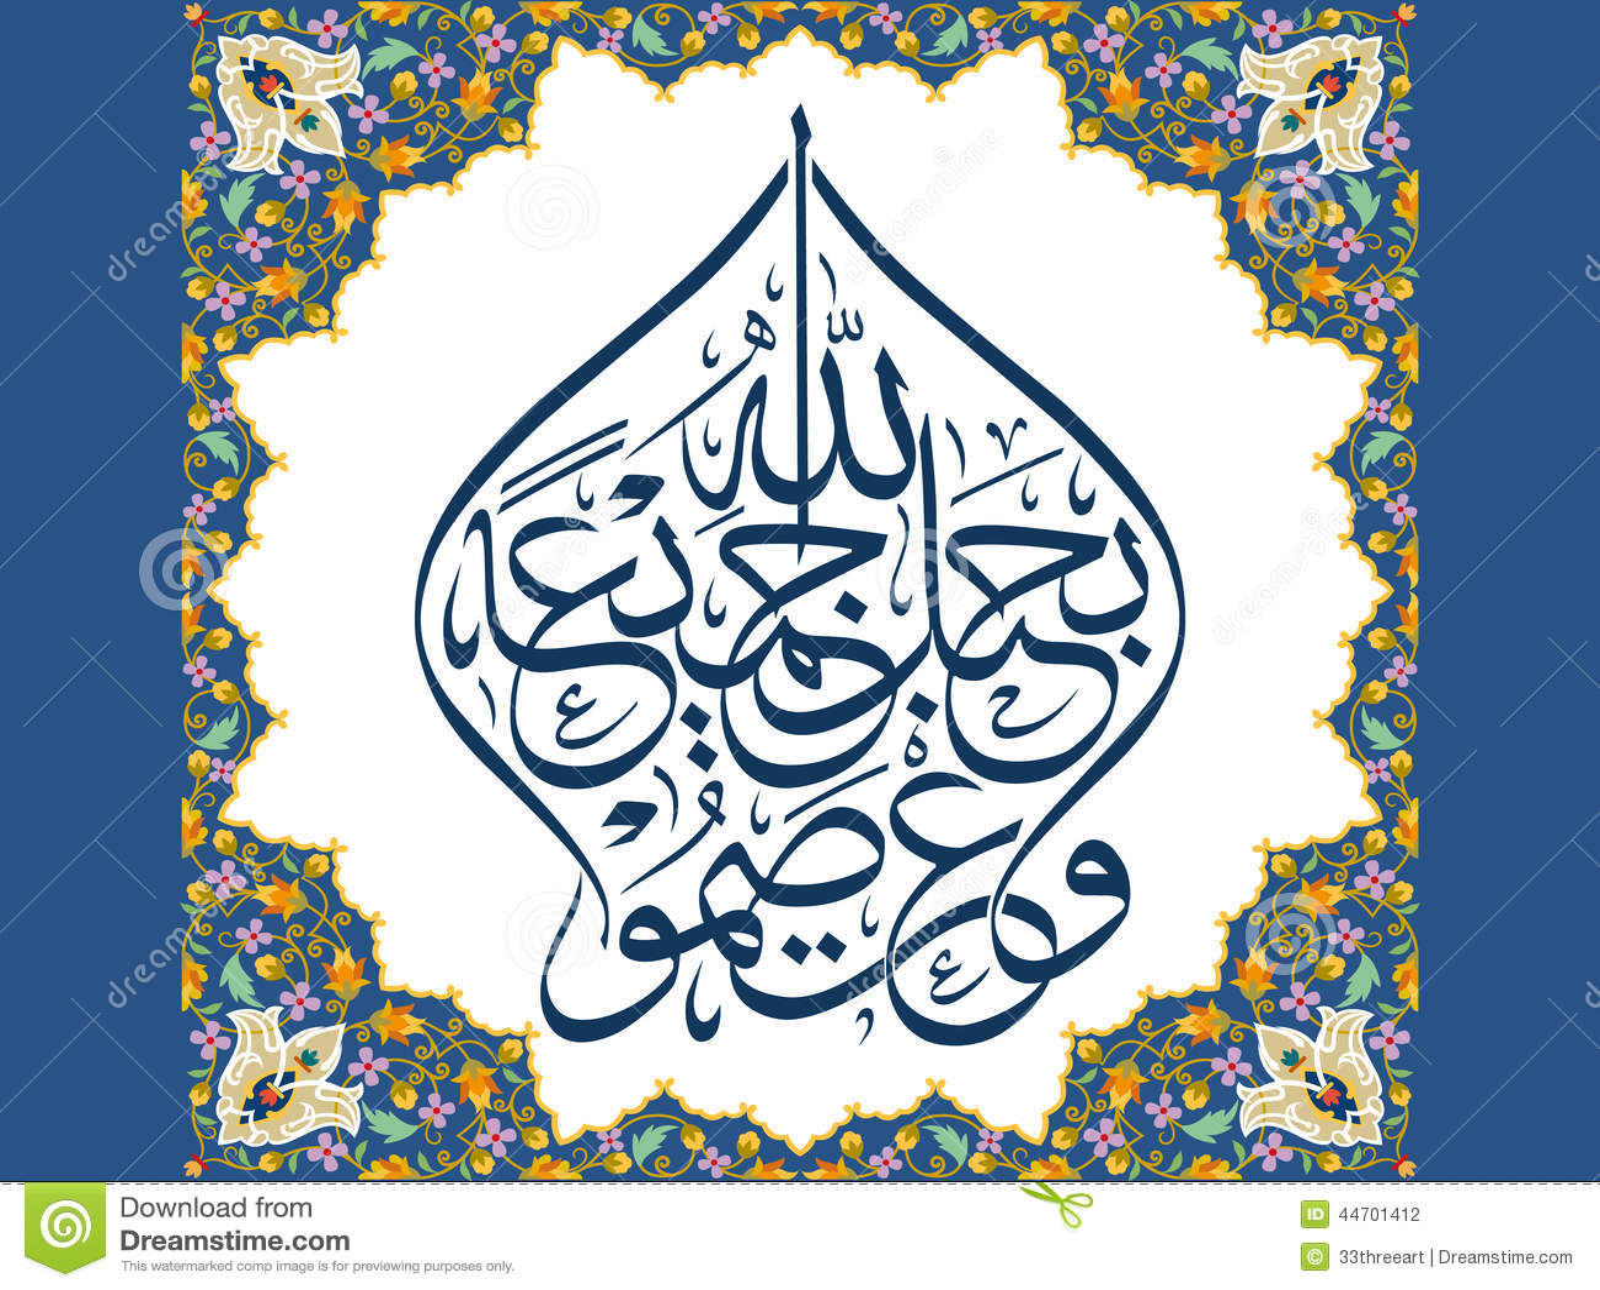 Quran verse stock vector image of modern islamic